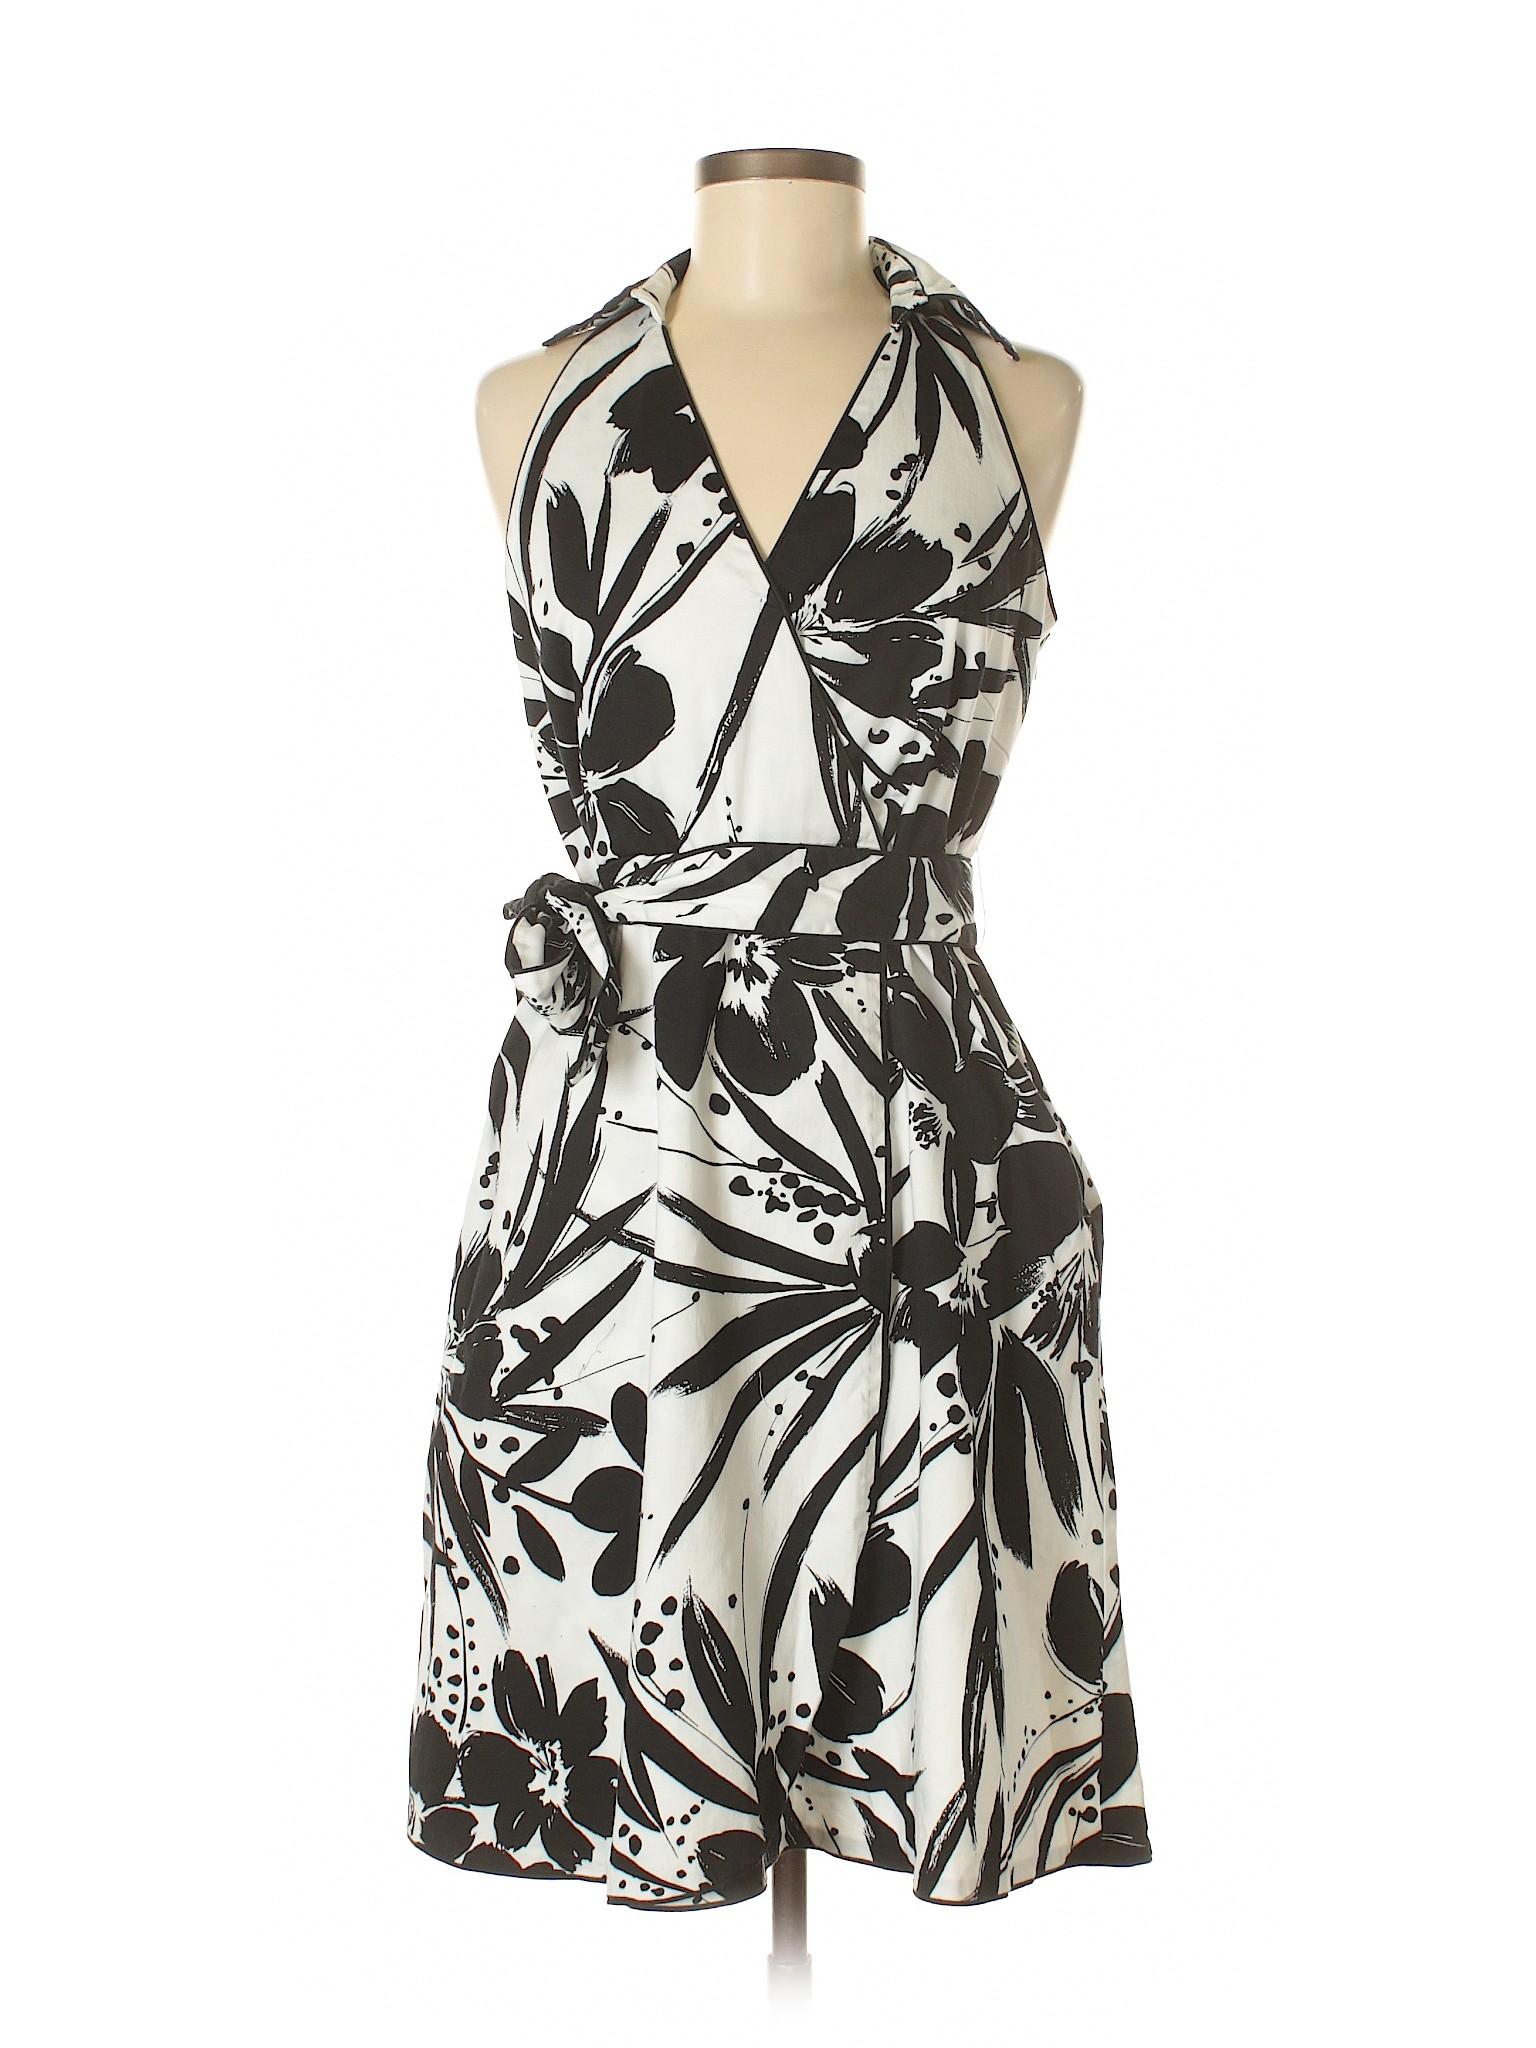 Dress Dress Spense Casual Selling Spense Dress Selling Selling Spense Casual Casual Selling Spense xSqA8Uw